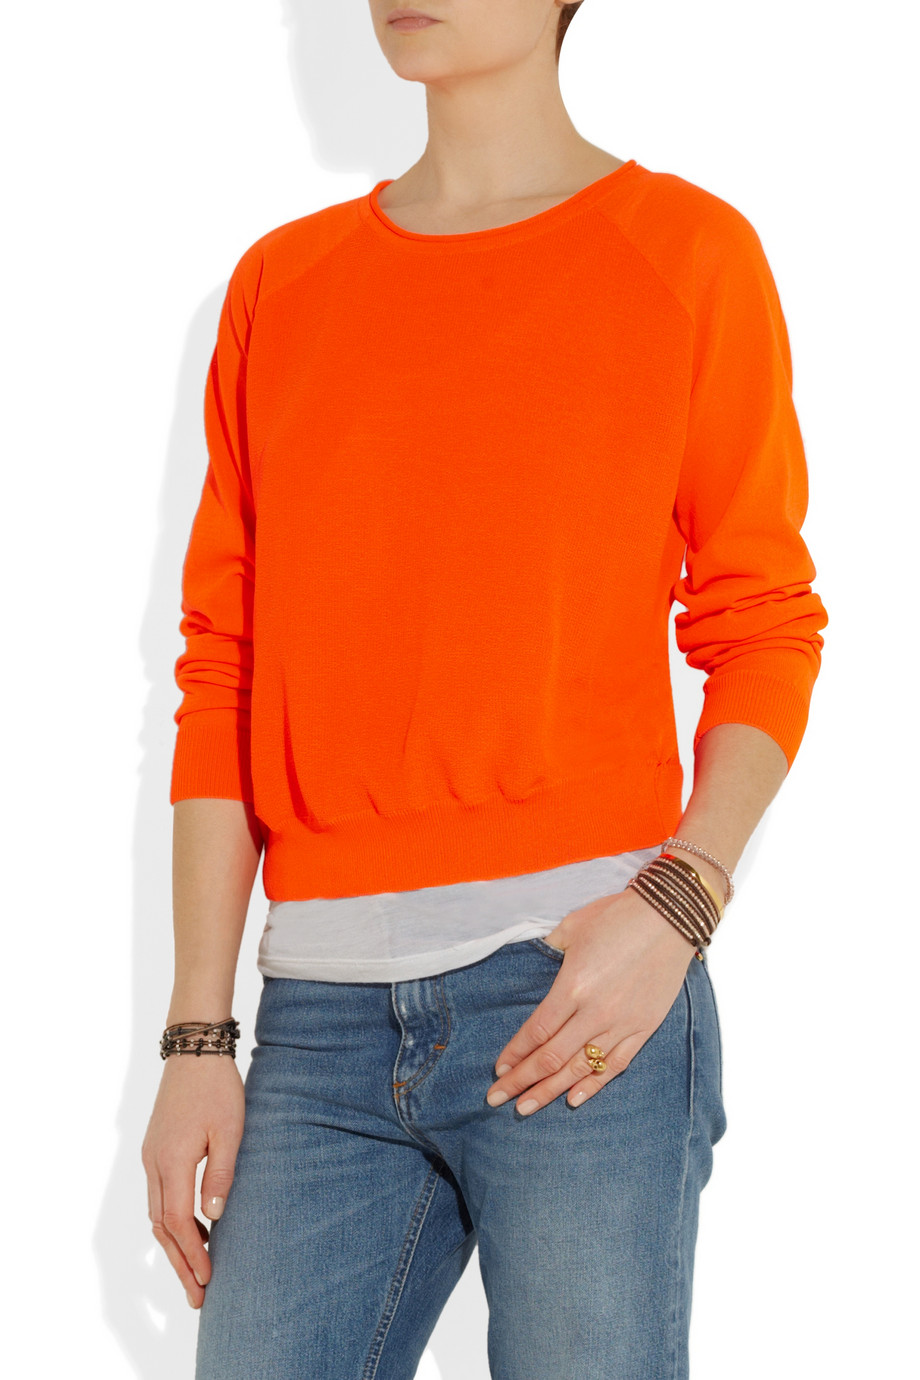 Dagmar Clem Neon Knitted Sweater in Orange | Lyst